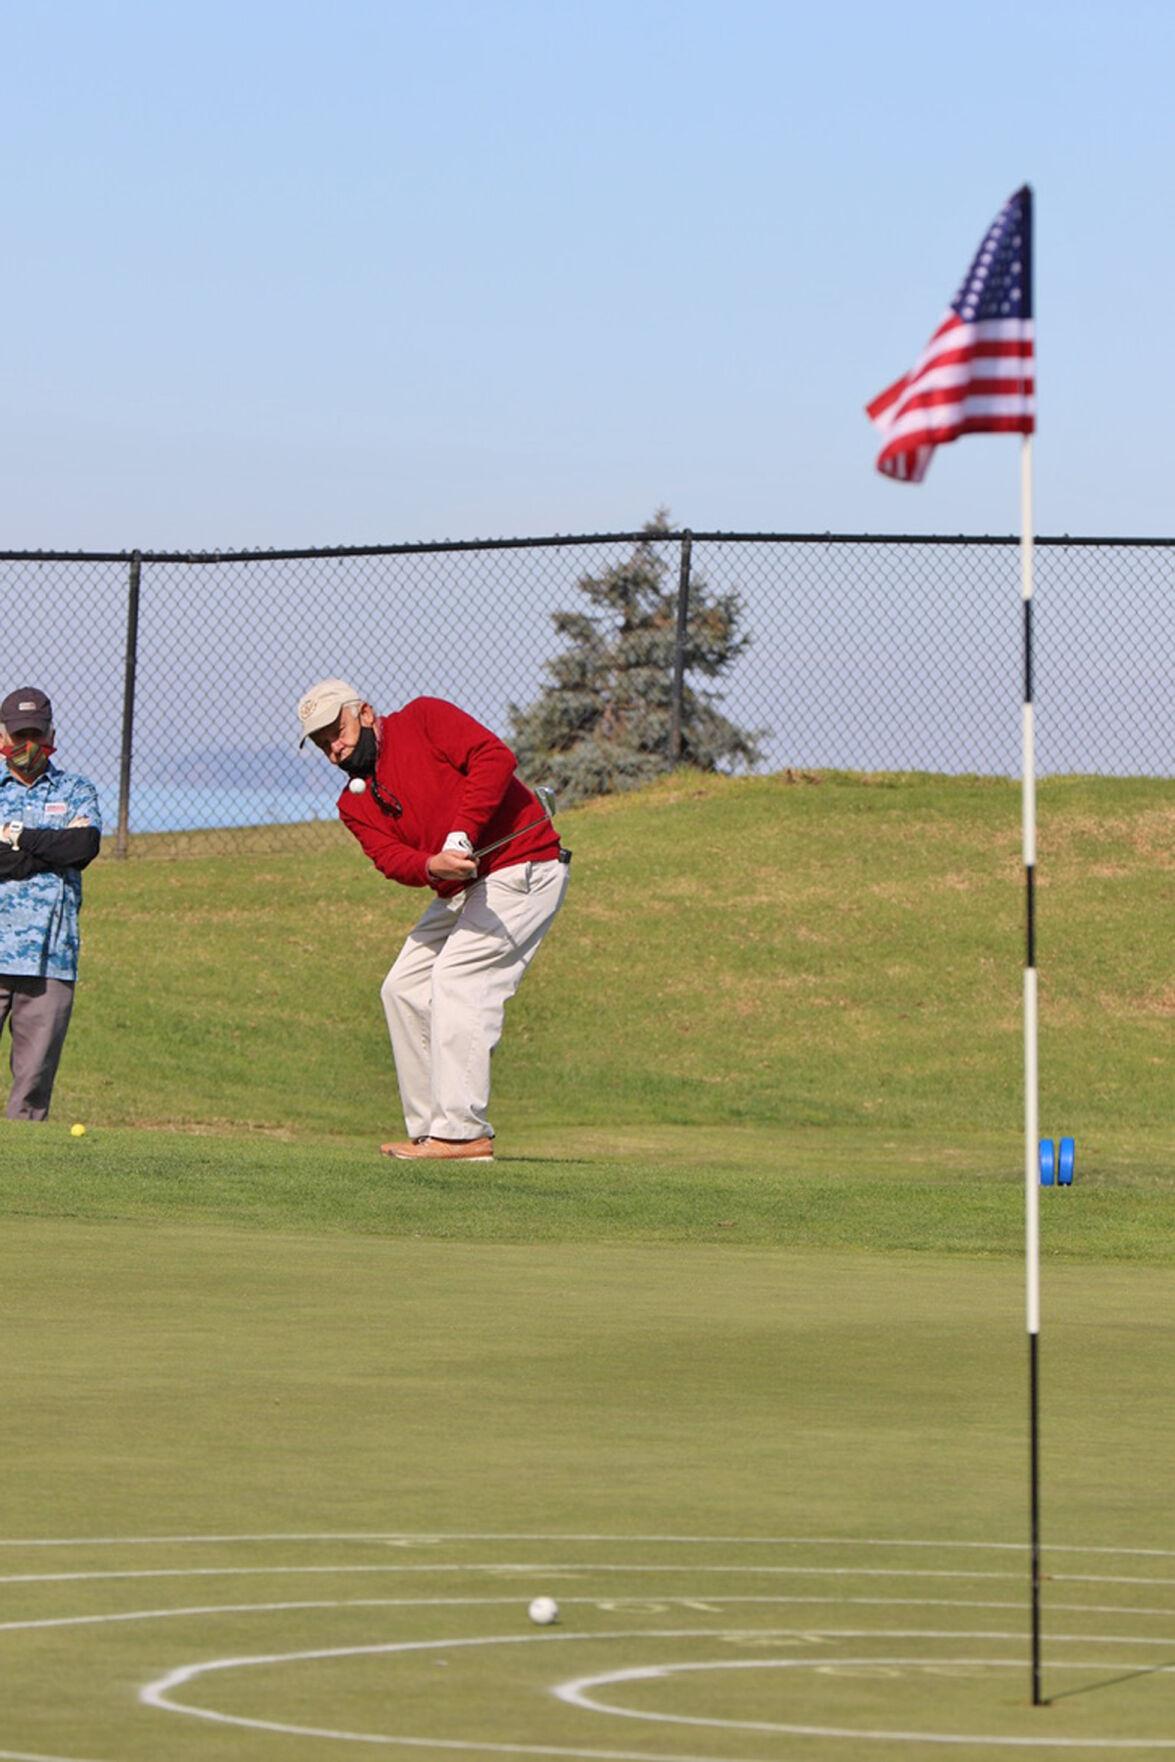 Veterans golf-chipping